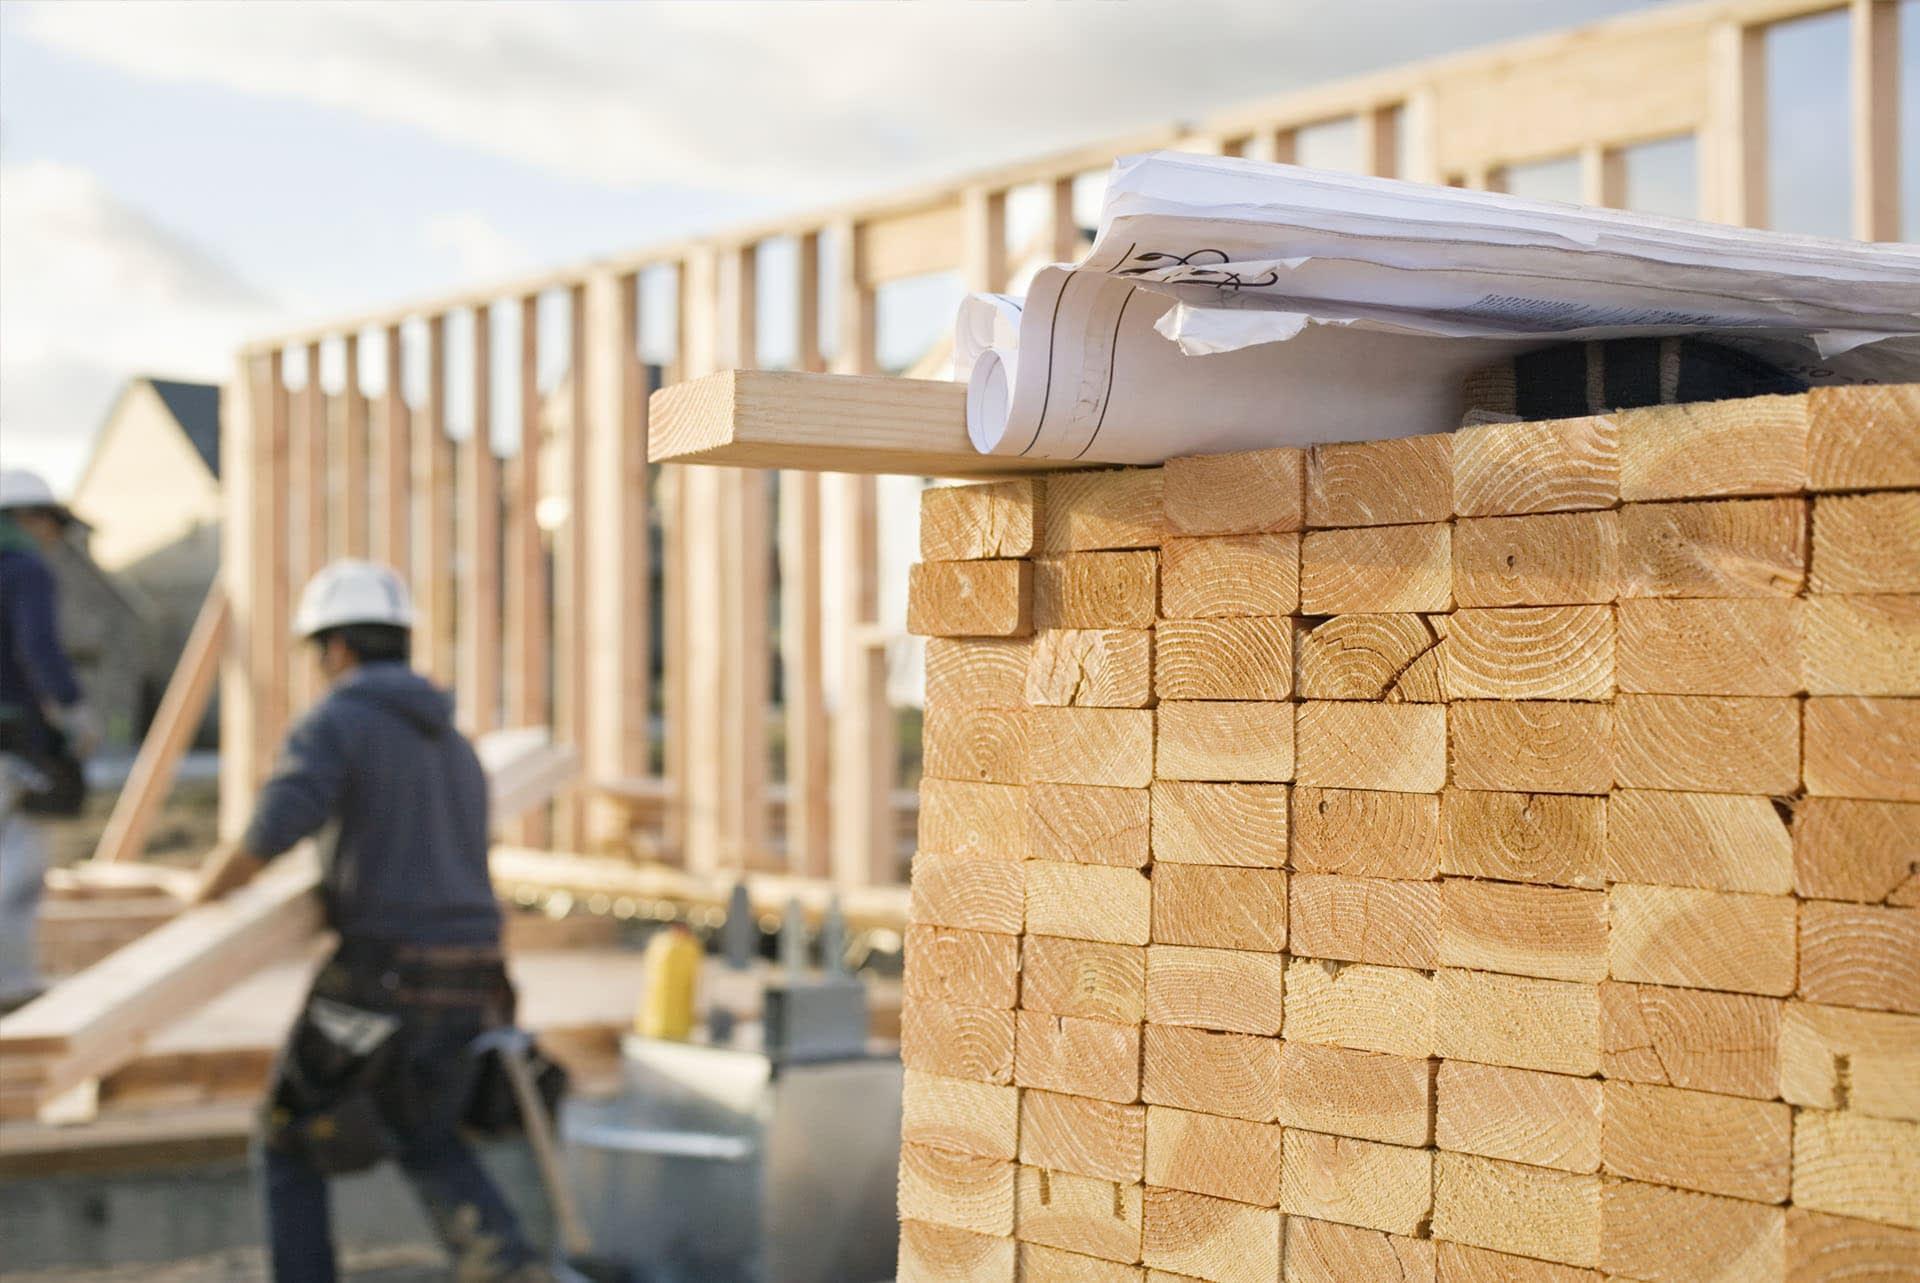 cls-canadian-lumber-standard-timber-treated-studwork-c16-alternative-outdoors-worker-pallet